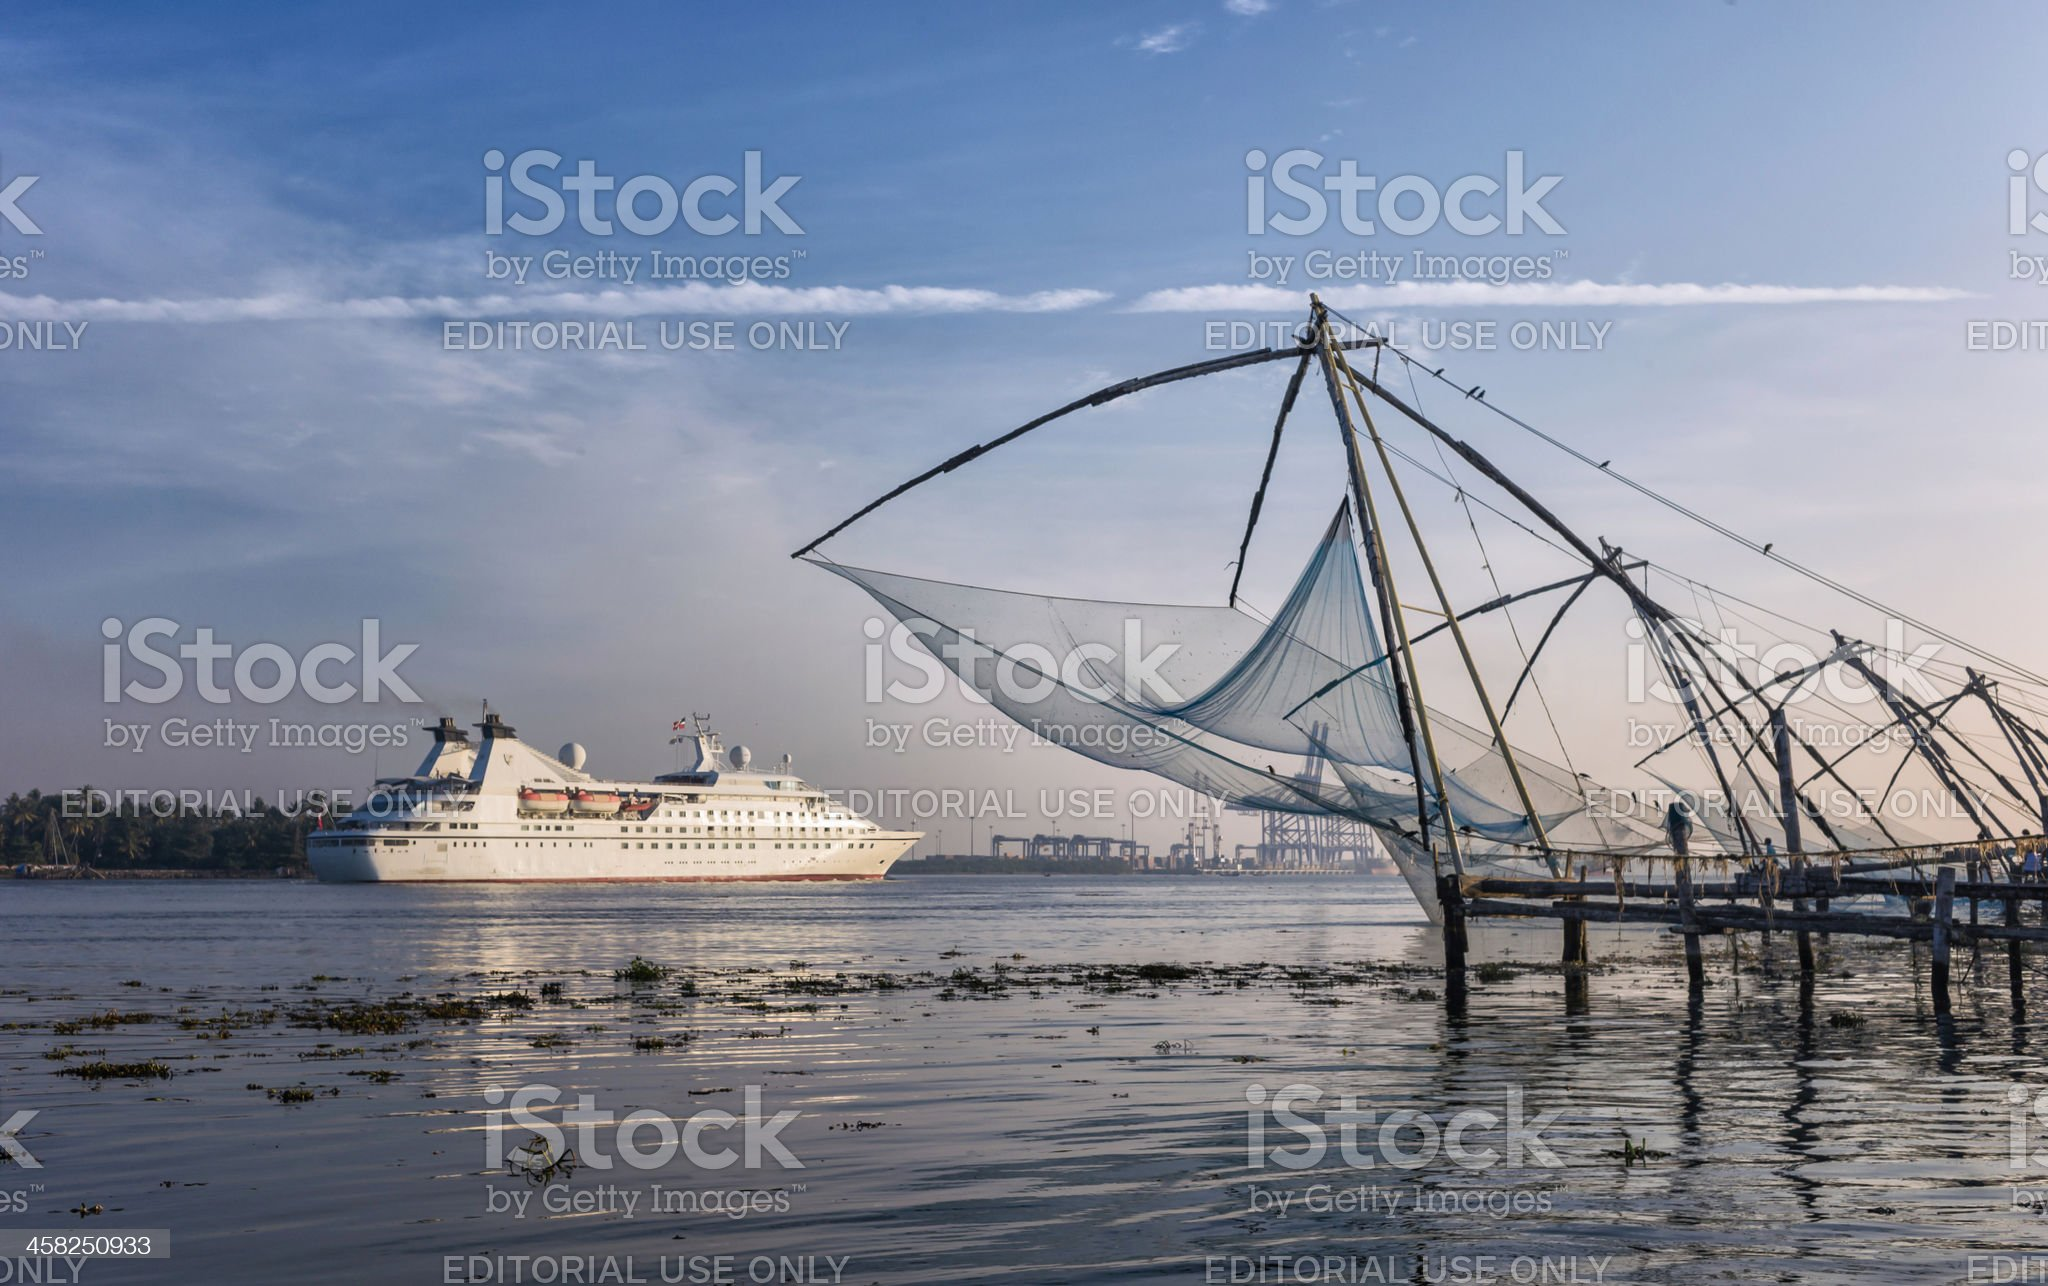 Passenger ship & Chinese fishing nets, Cochin, Kerala, India. royalty-free stock photo